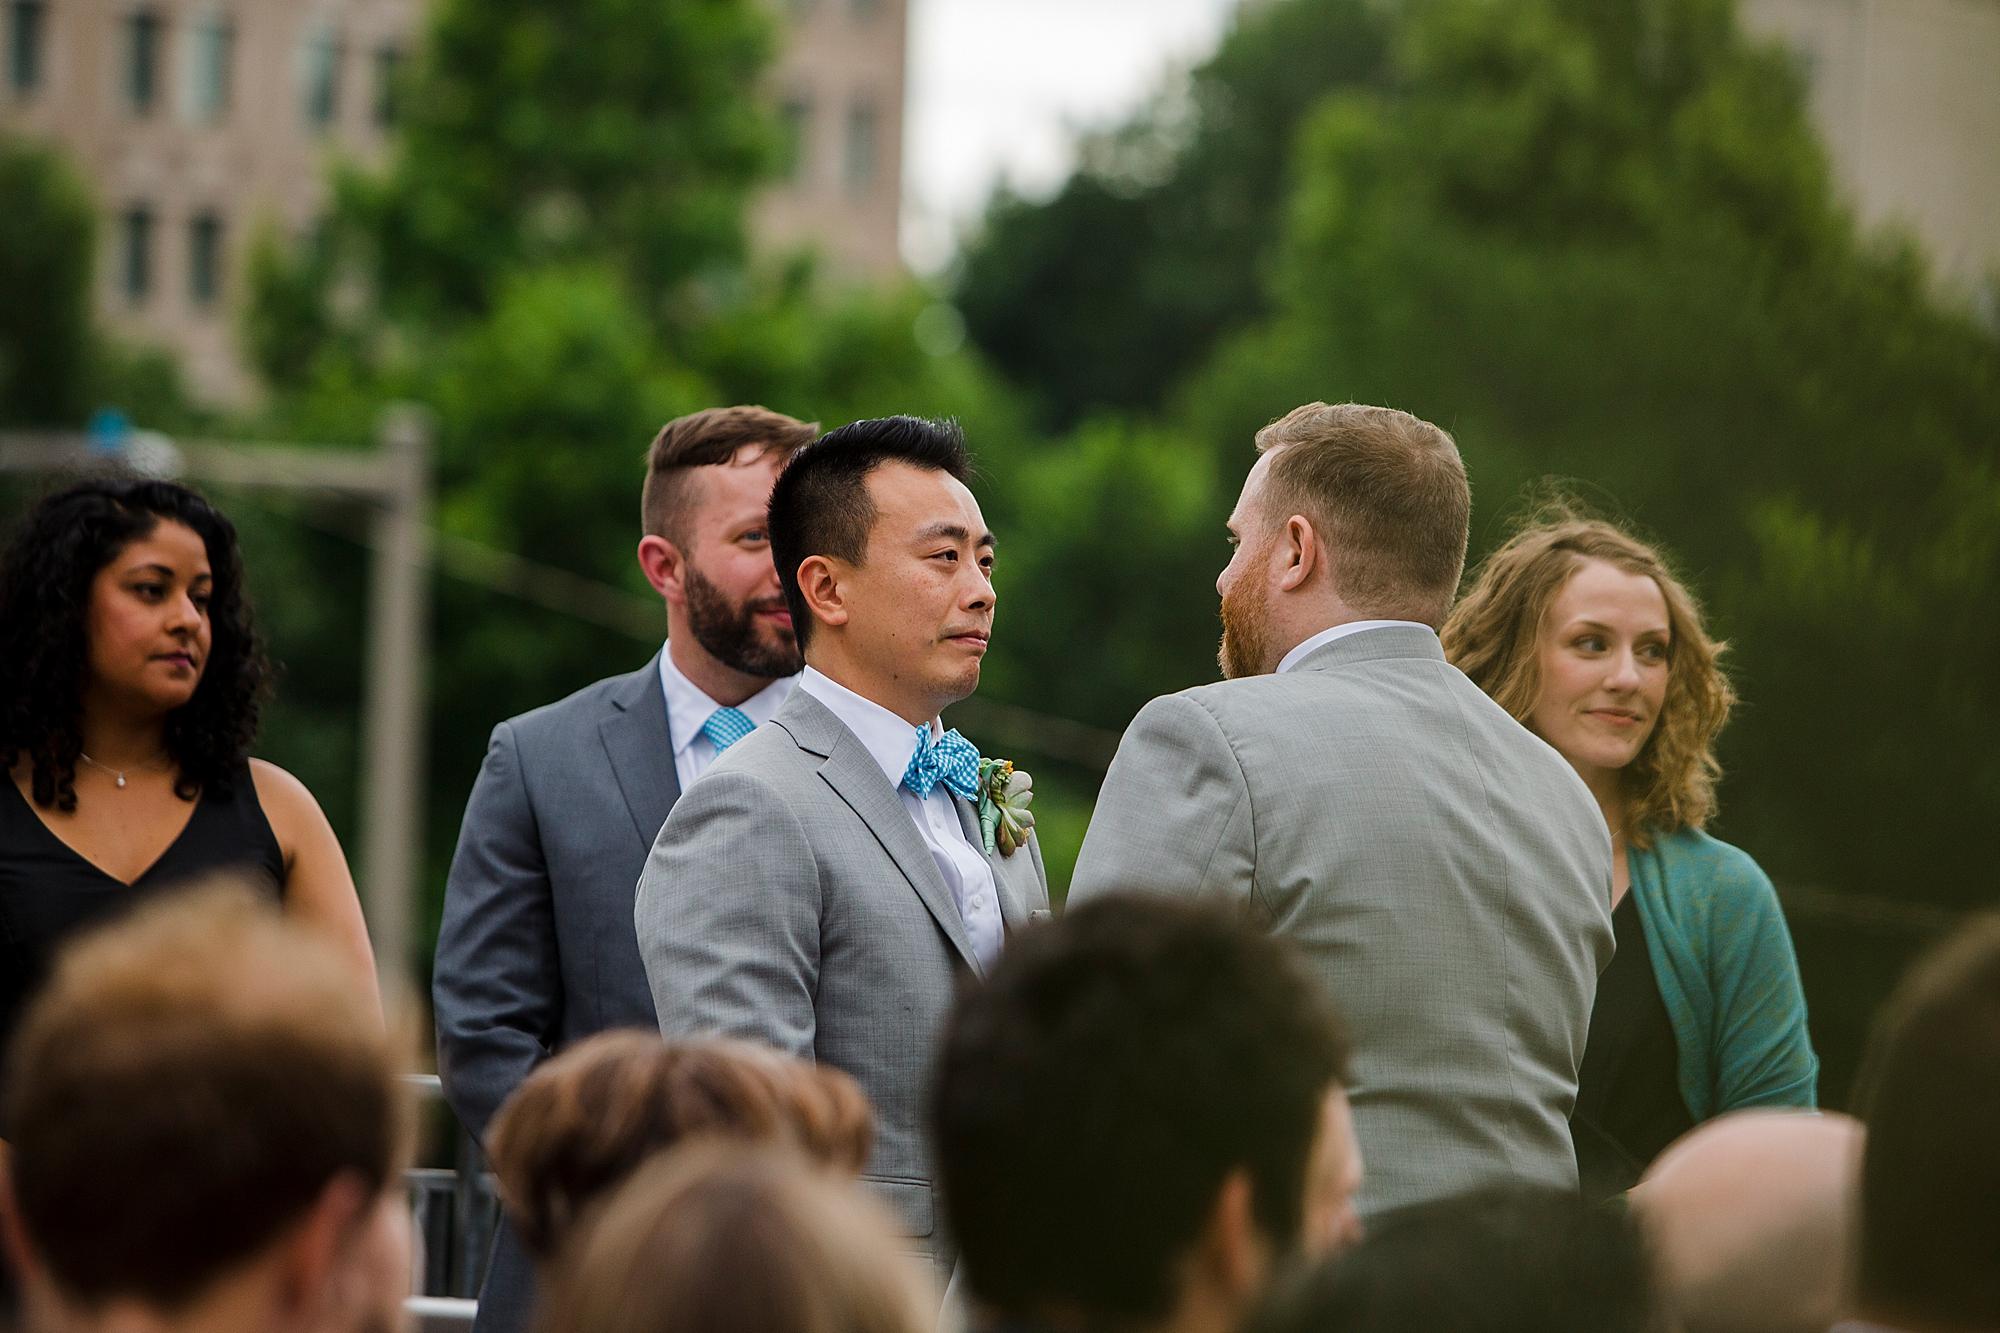 Dan_and_Byron_Love_by_Joe_Mac_Philadelphia_Wedding_LGBTQ_Photography_Gay_Independence_visitor_Center_94.JPG